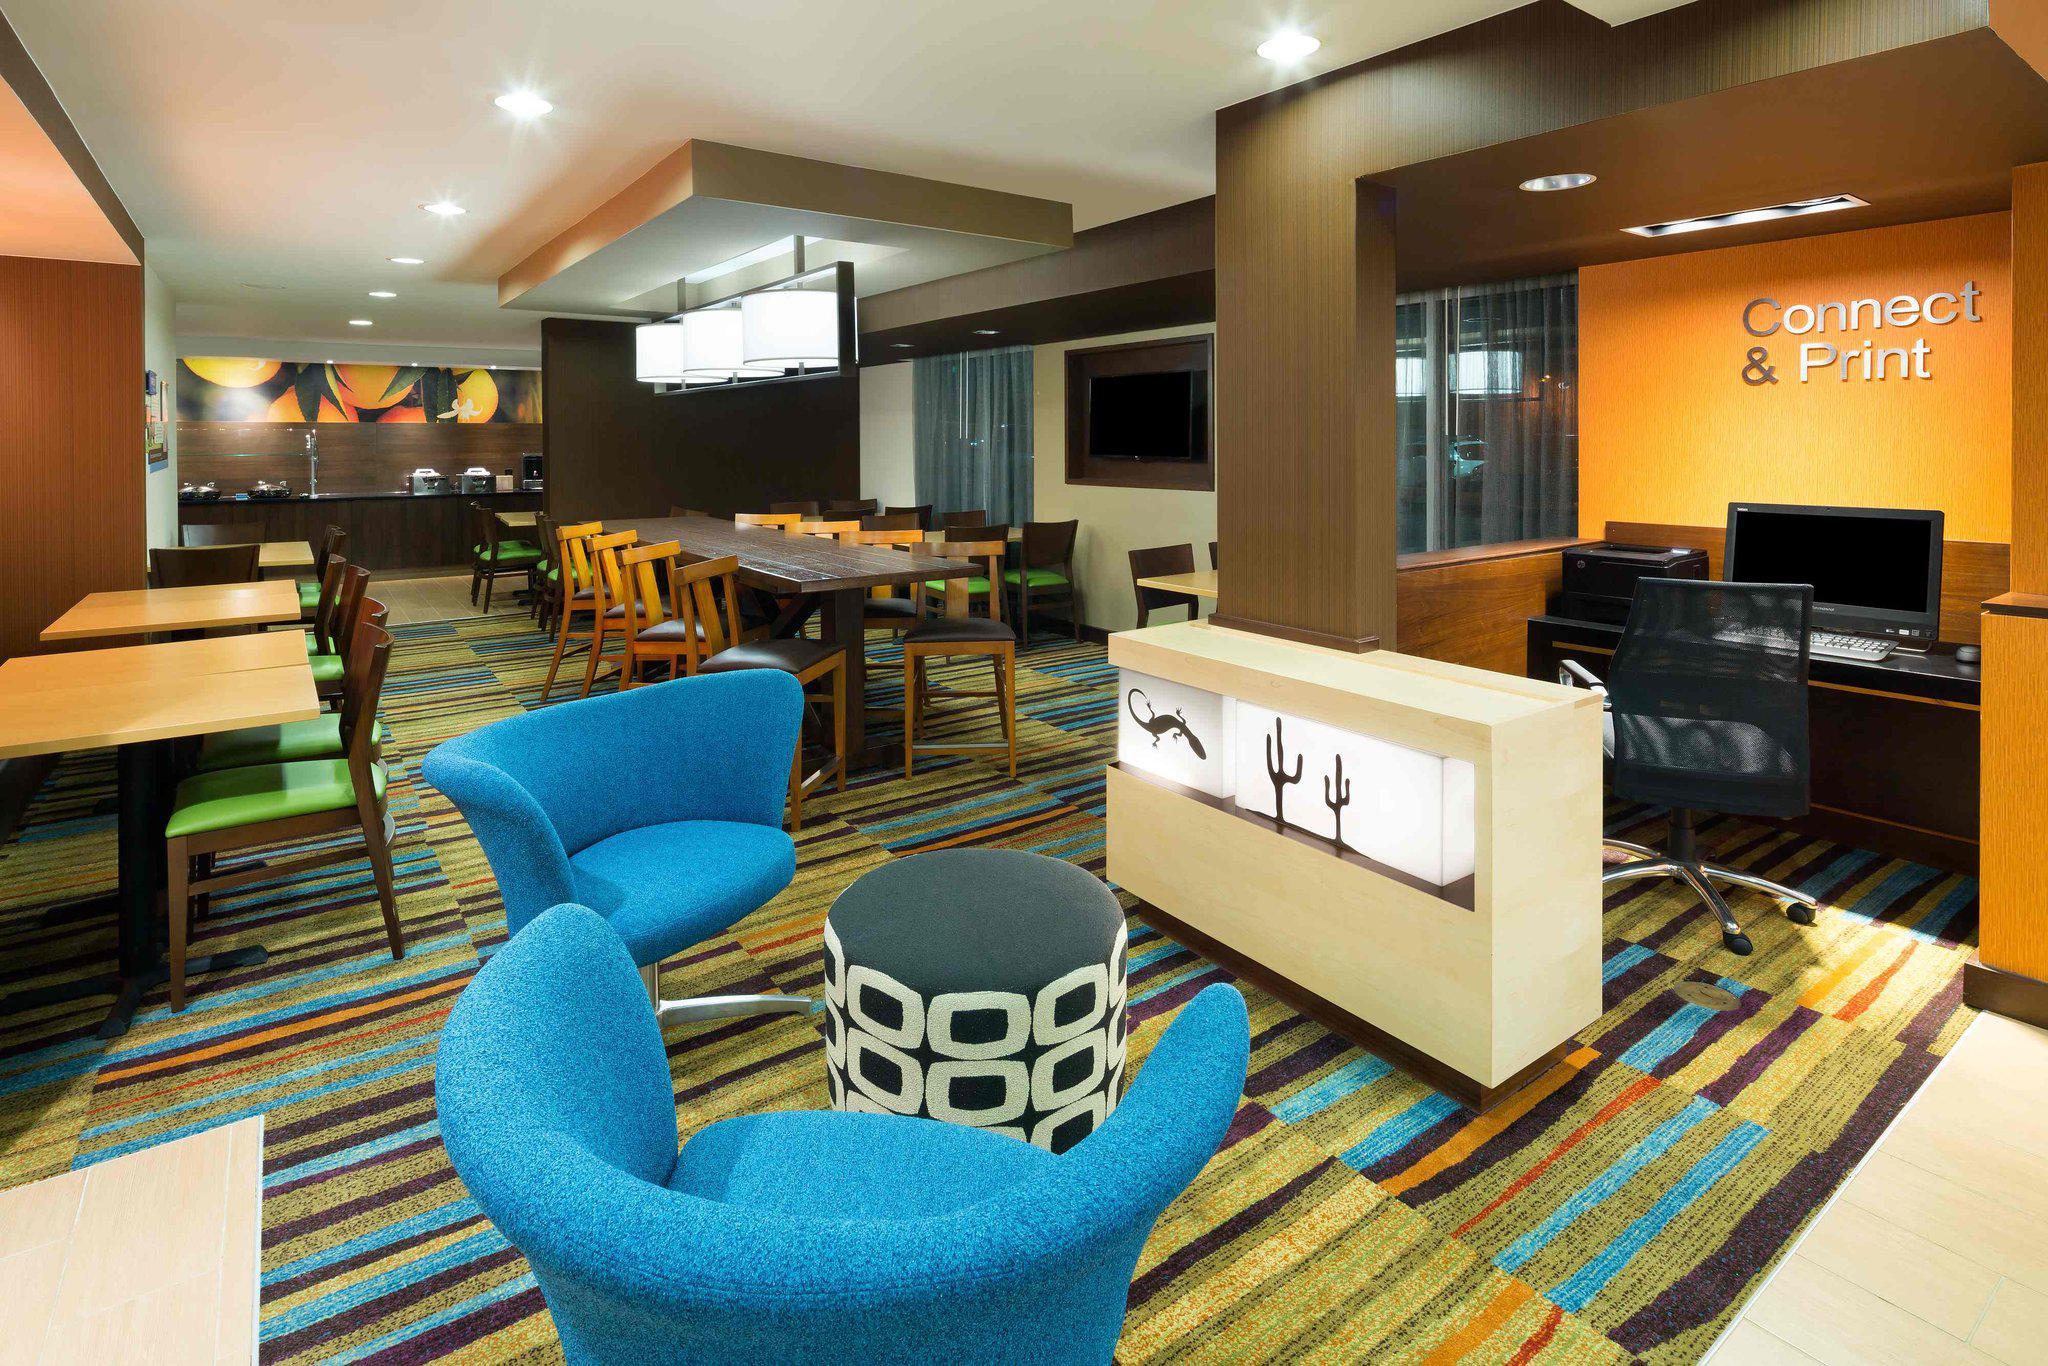 Fairfield Inn & Suites by Marriott San Antonio Airport/North Star Mall